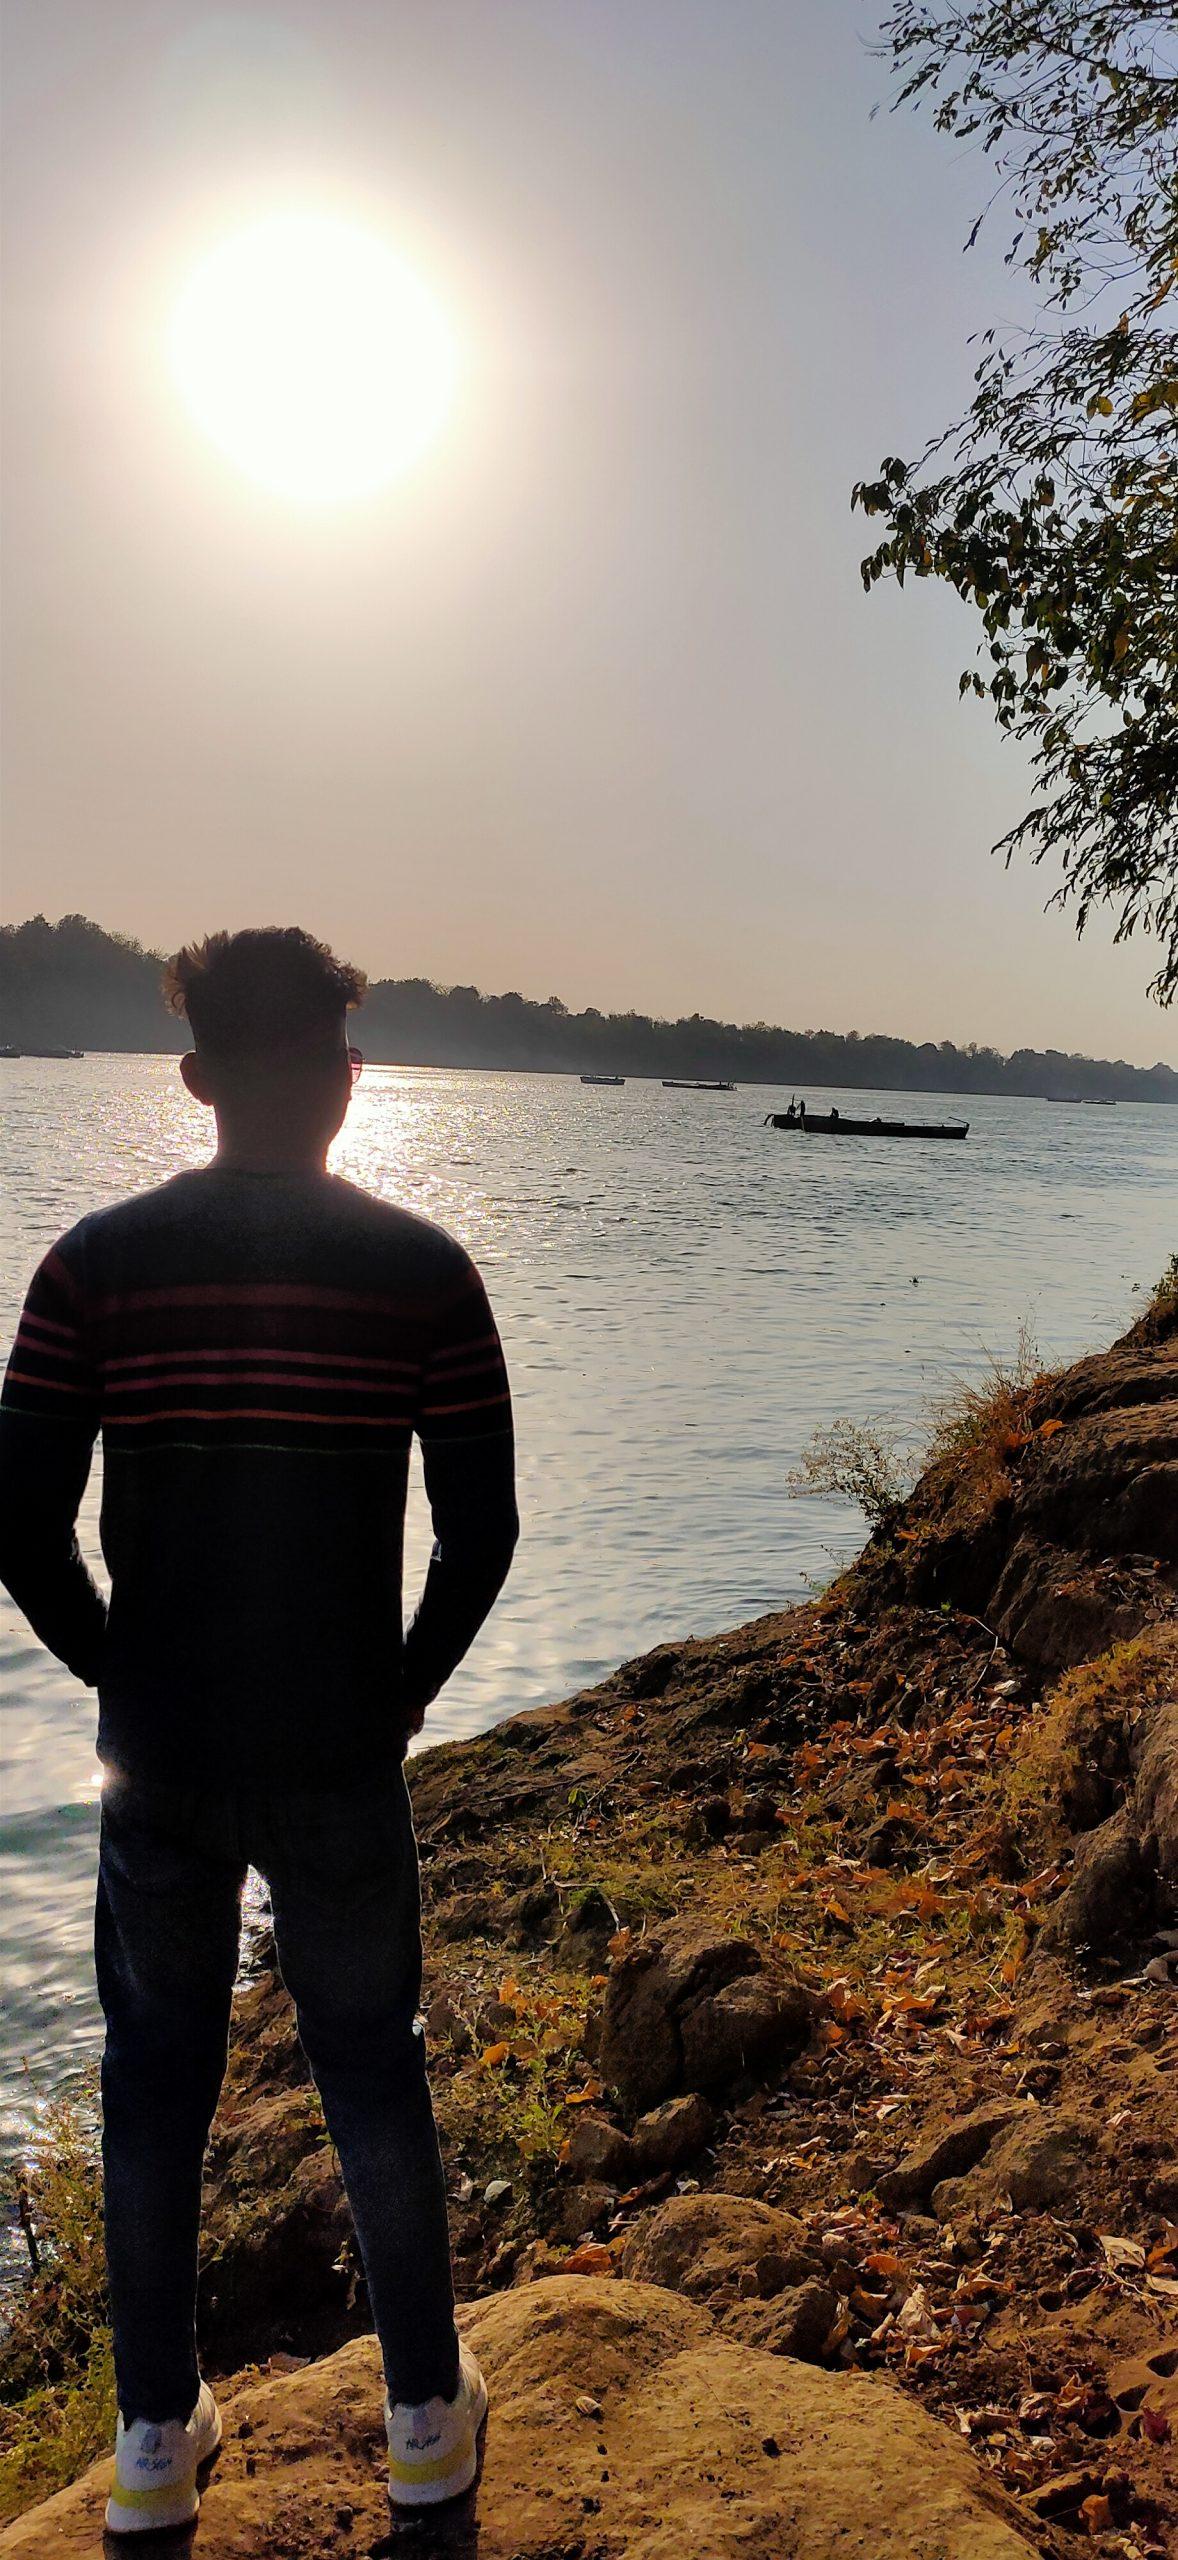 Boy posing river side